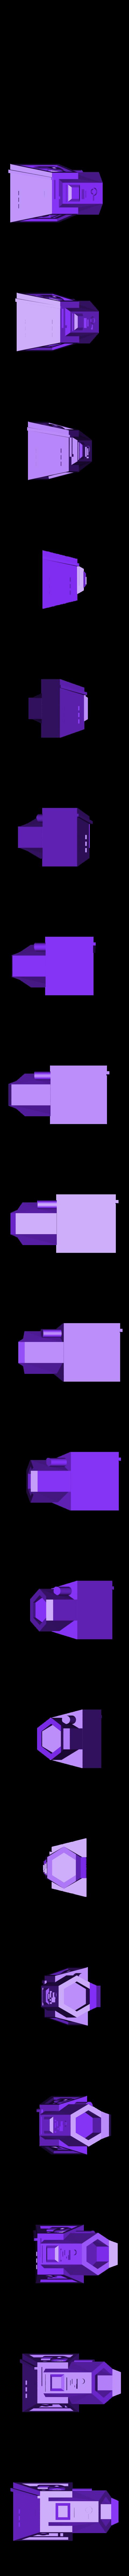 Mech_dos.stl Download free STL file Mech Warrior • 3D print object, Snorri